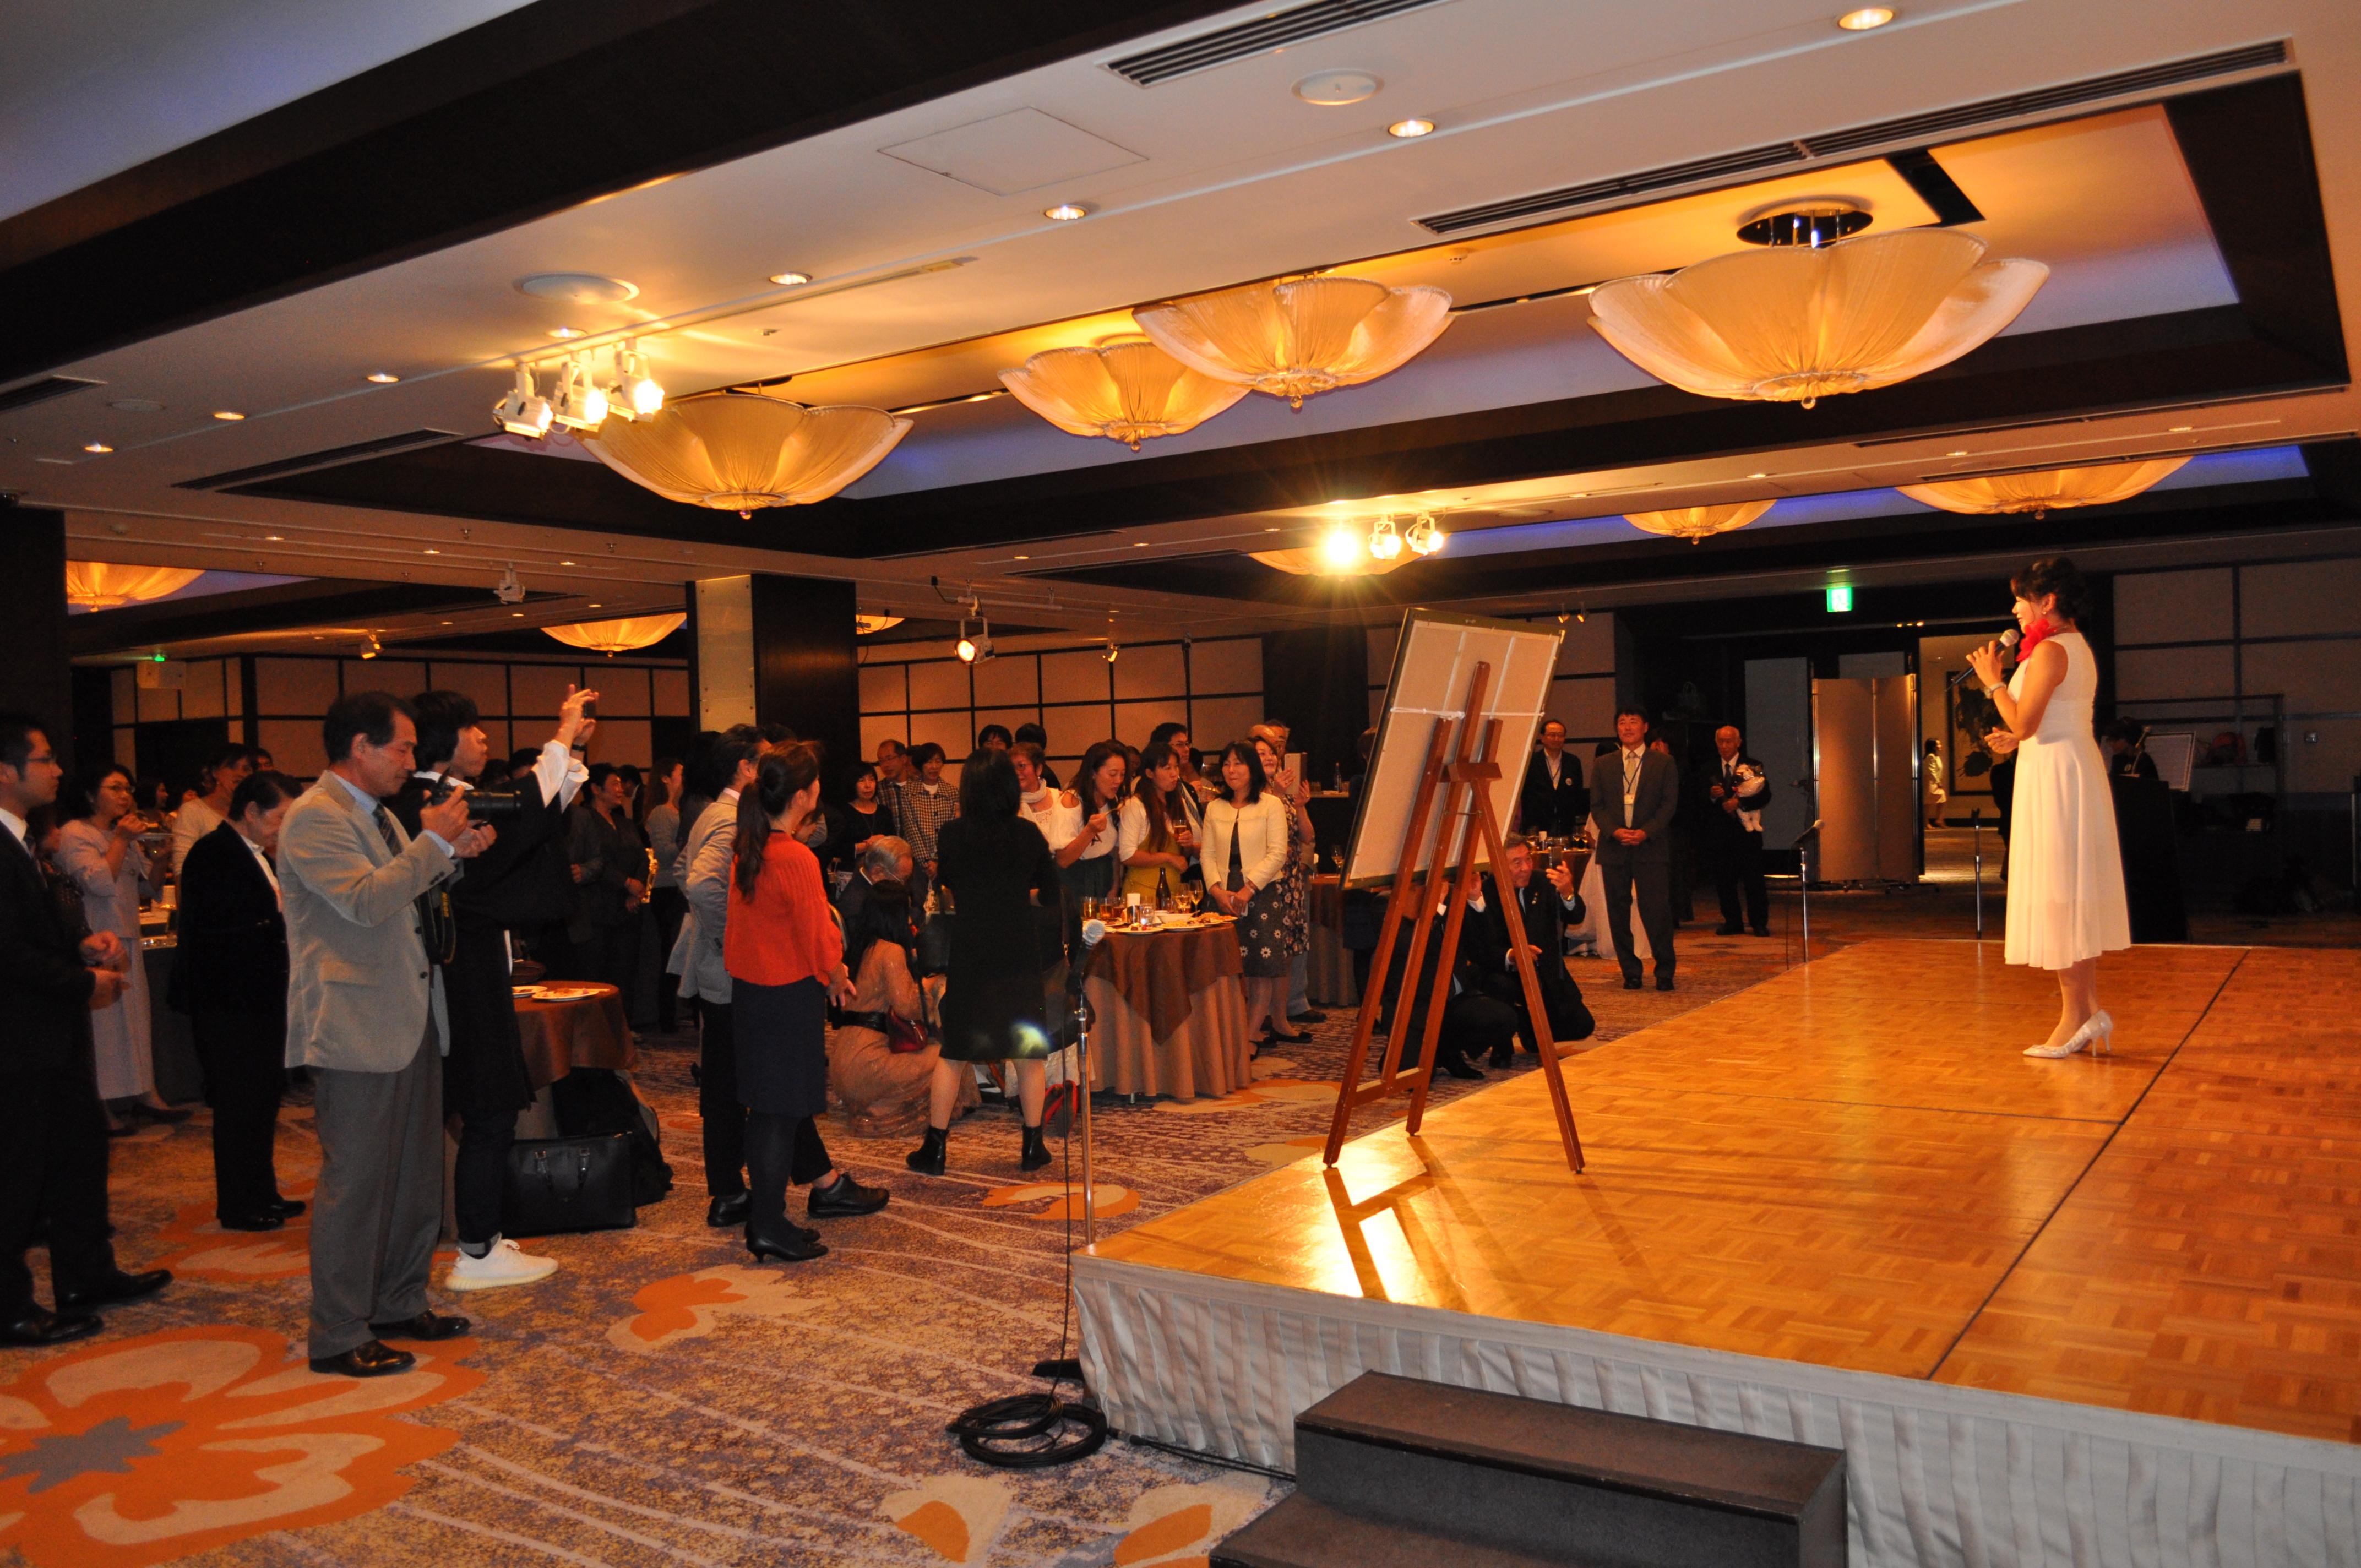 DSC 0483 - 第6回思風会全国大会2018in東京開催